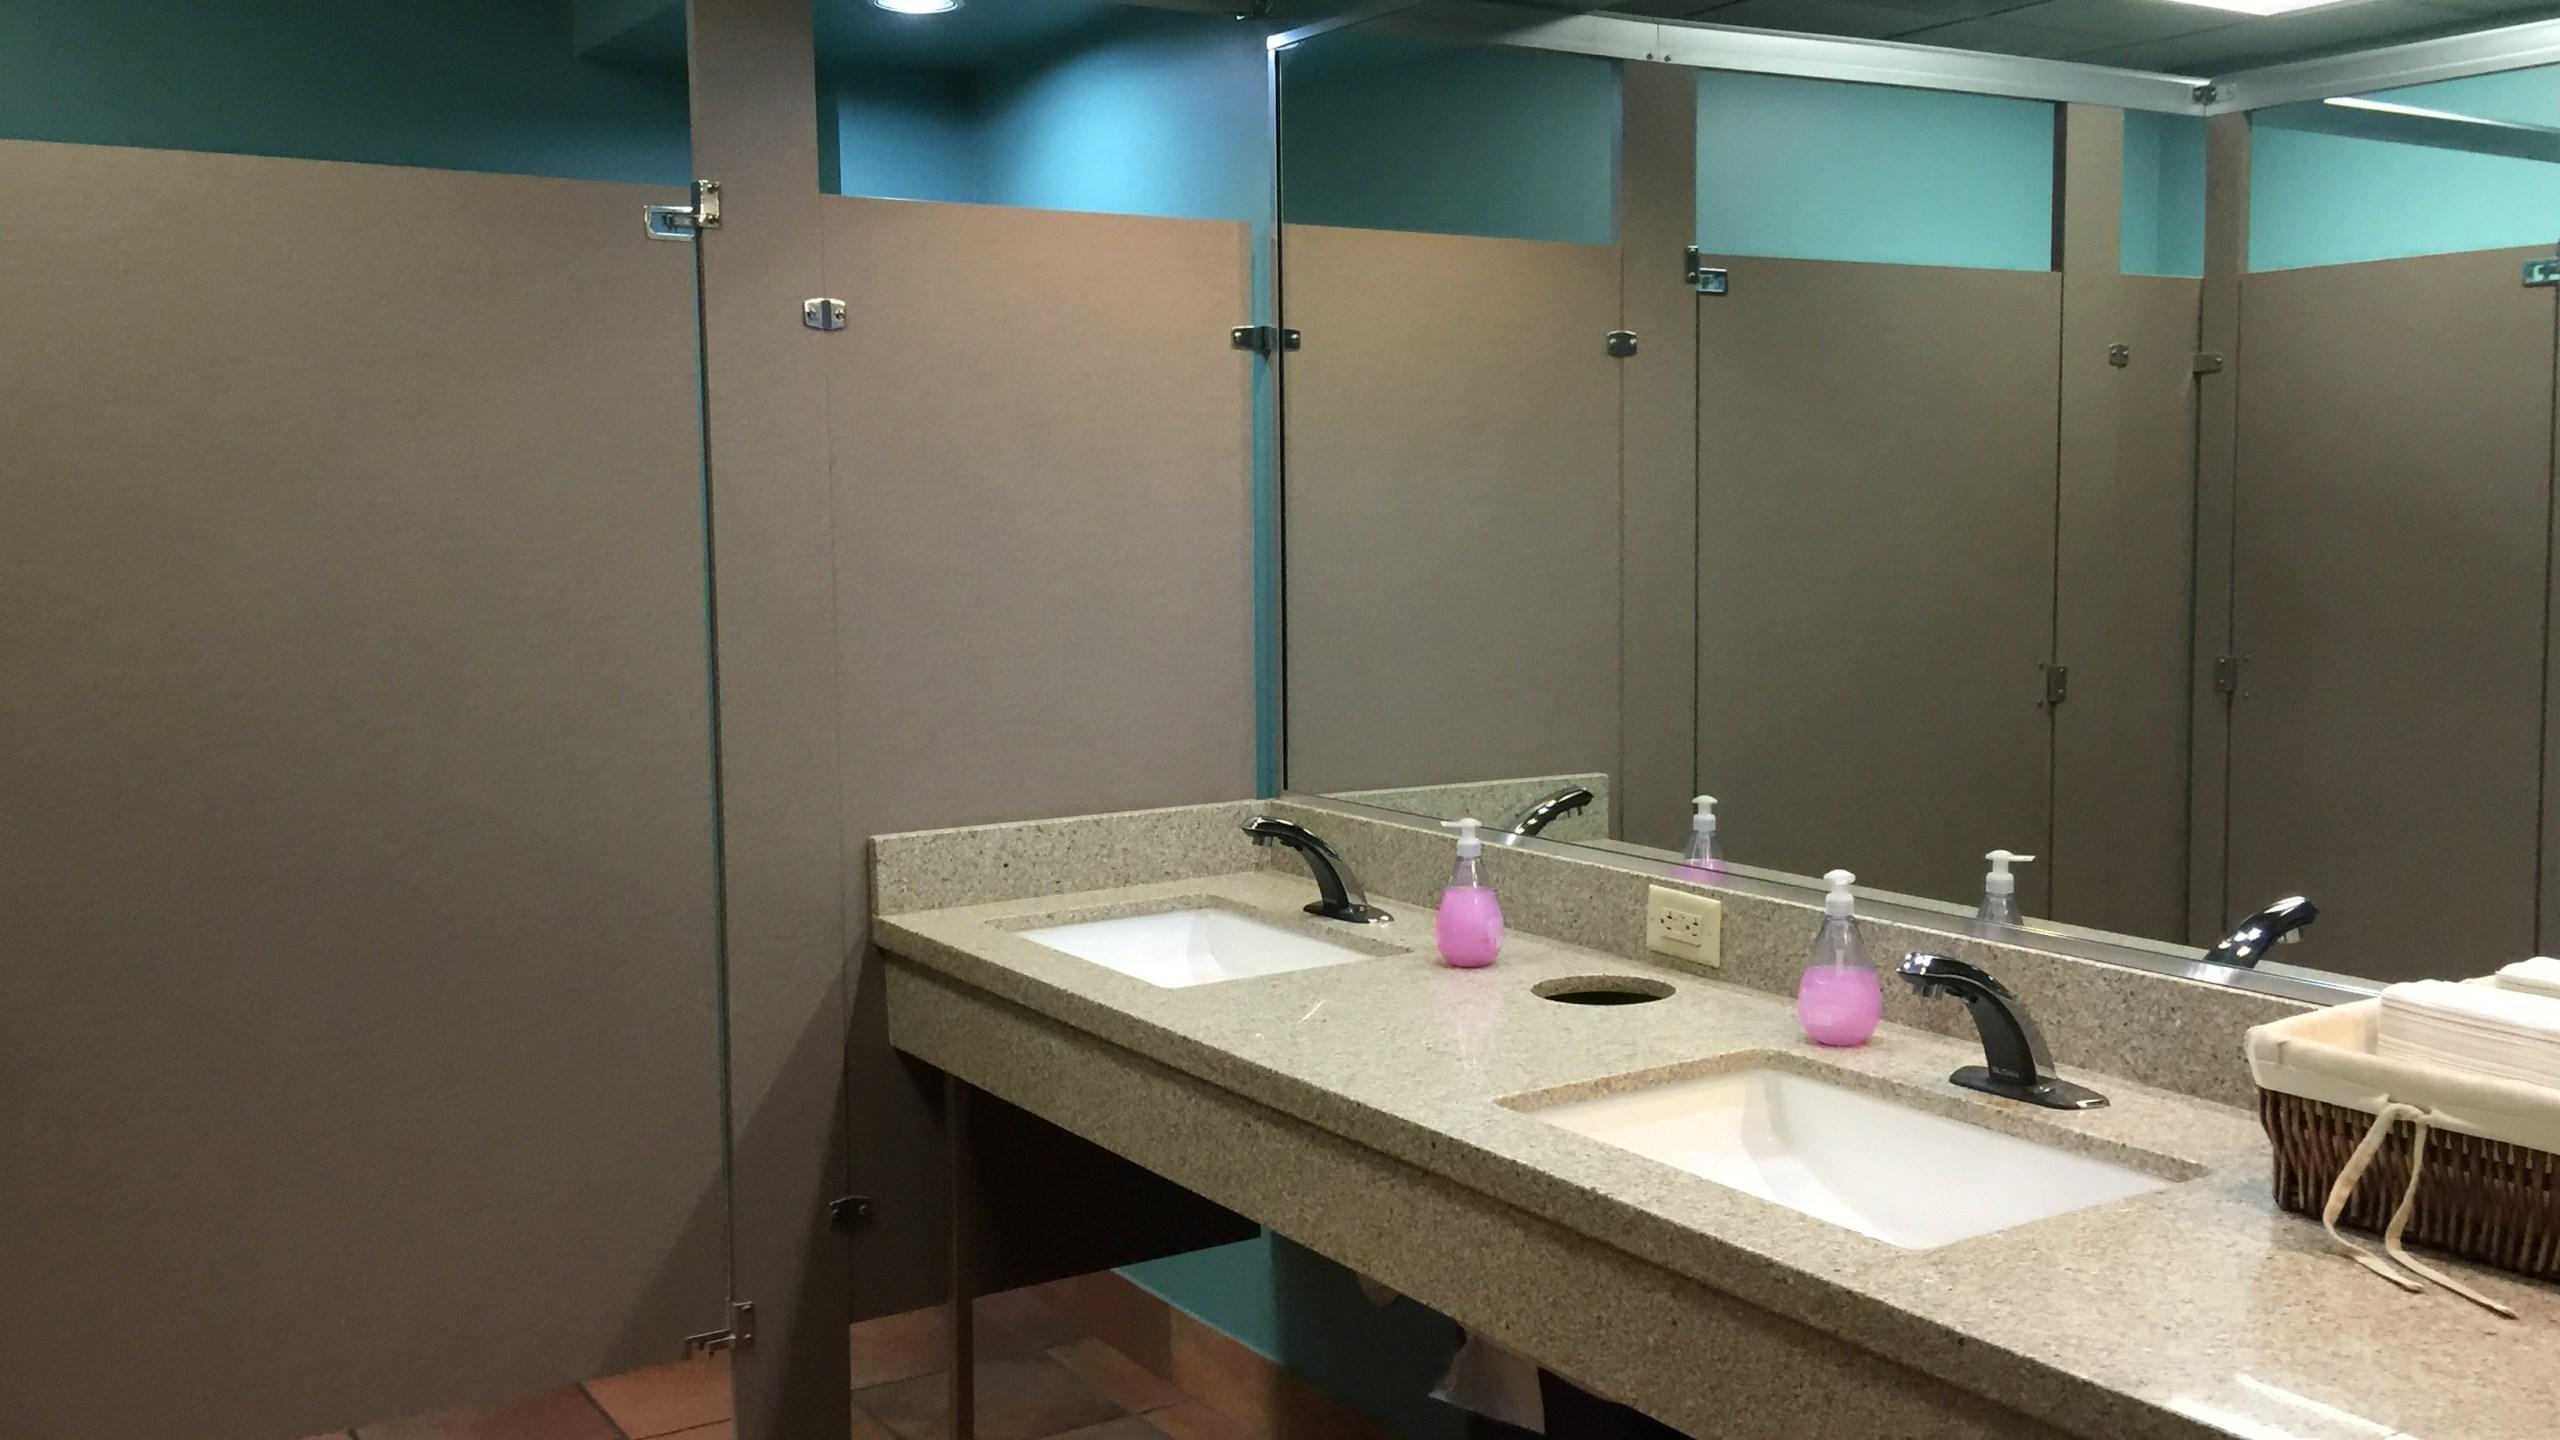 Bathroom sink_85151